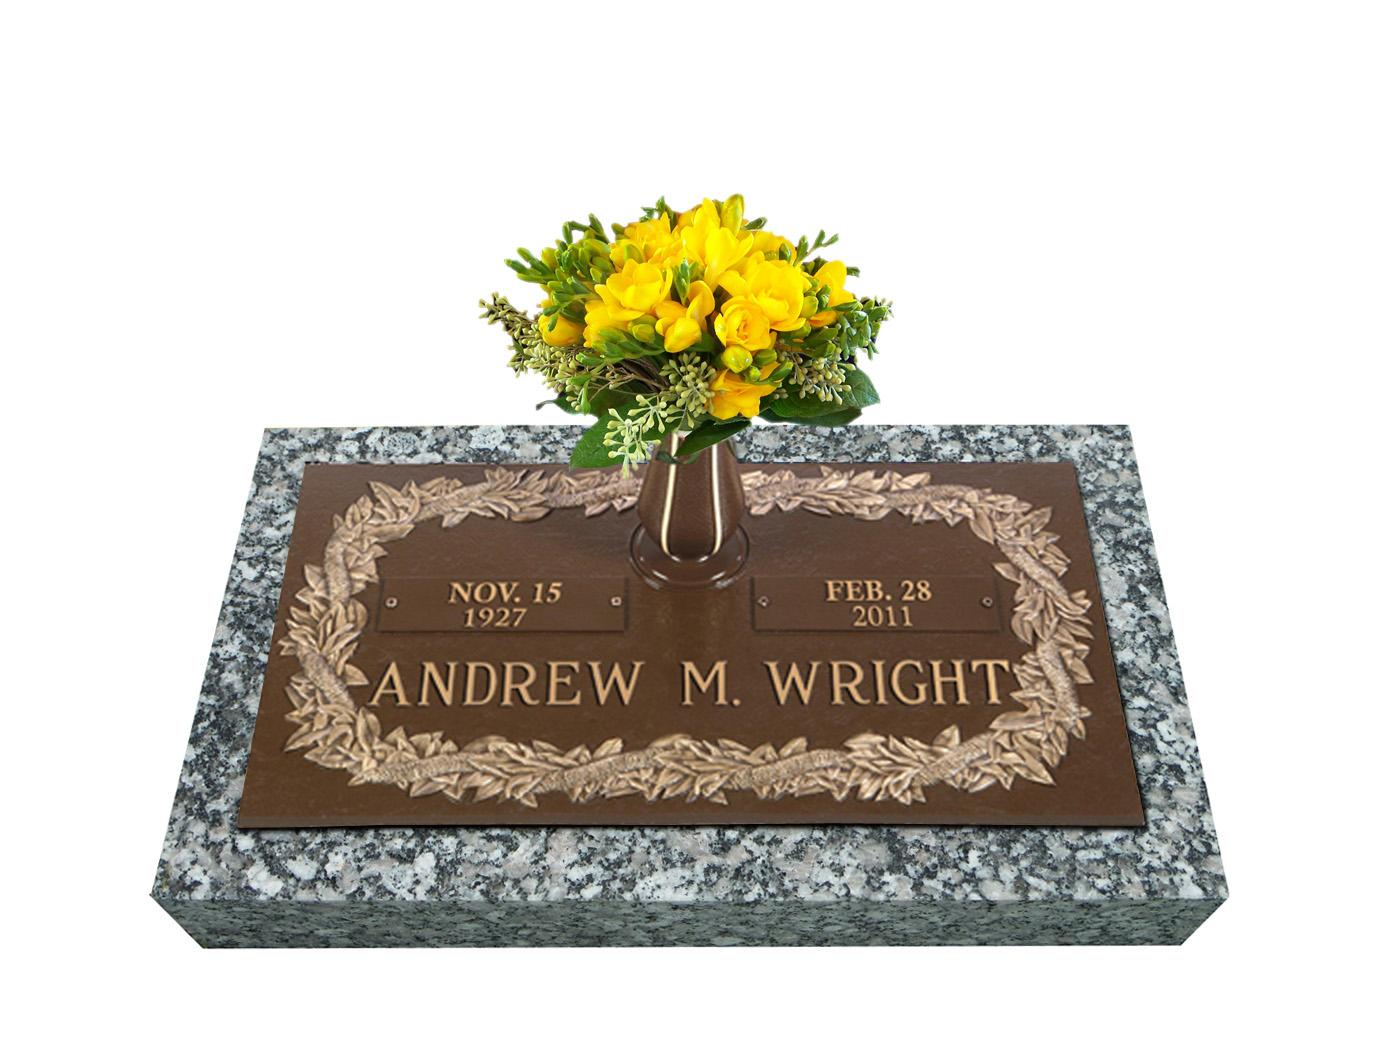 Hawaiian ilima lei single bronze grave marker with vase single bronze cemetery marker reviewsmspy